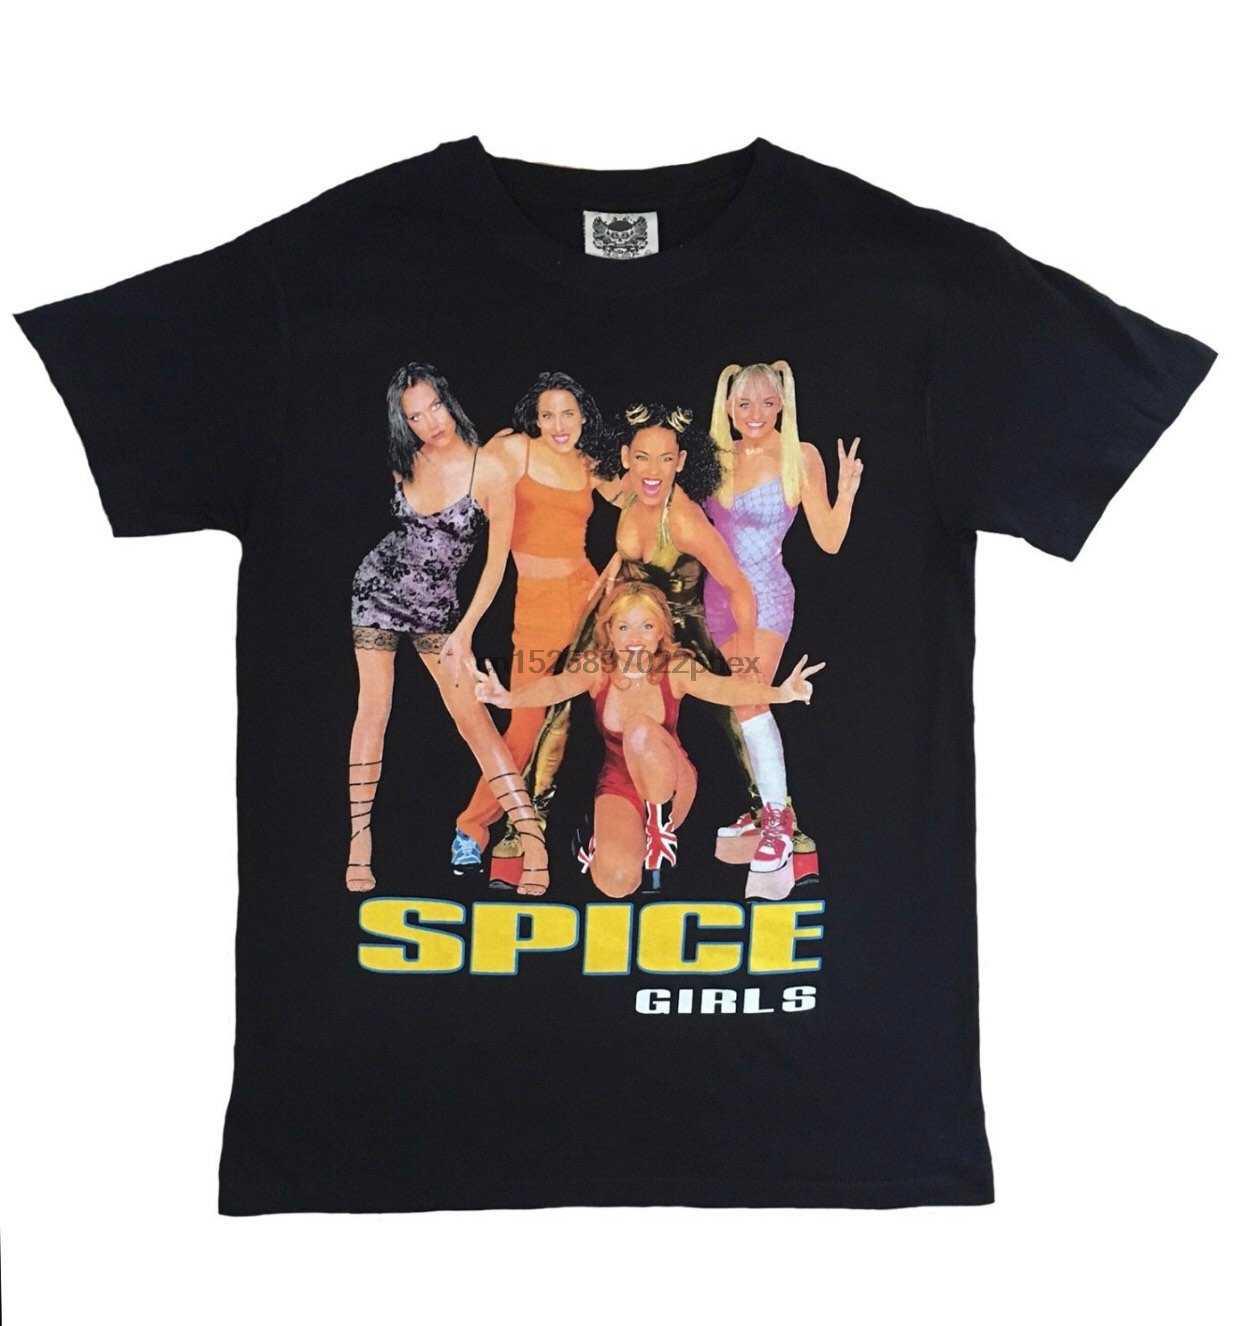 Unisex Ladies Mens Black Grunge Retro Vintage NIRVANA Bleach T-Shirt